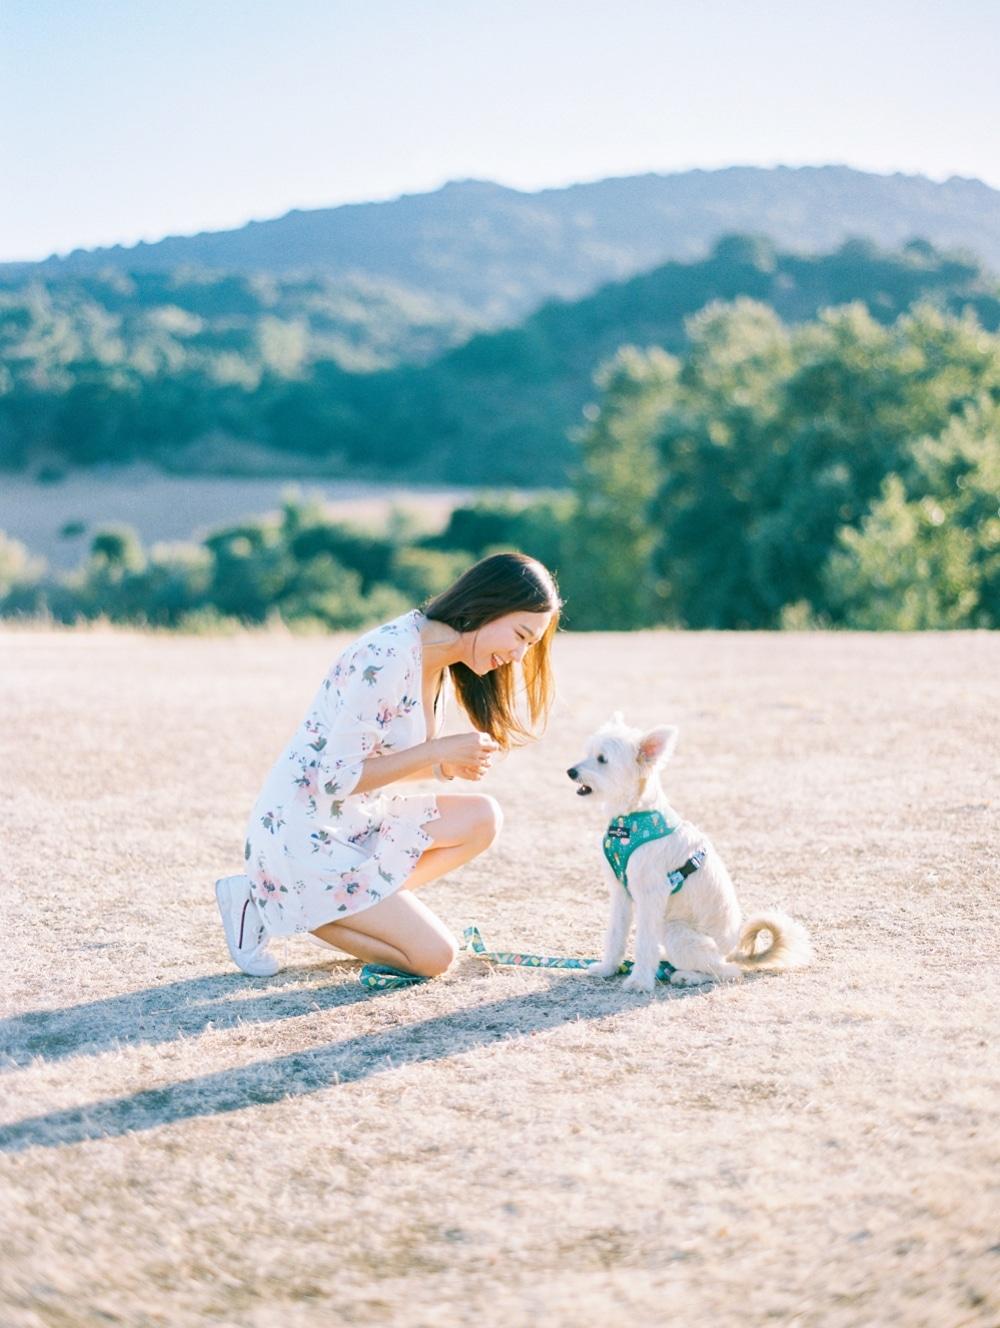 Kristin-La-Voie-Photography-california-wedding-photographer-dog-session-rancho-san-antonio-los-altos-43